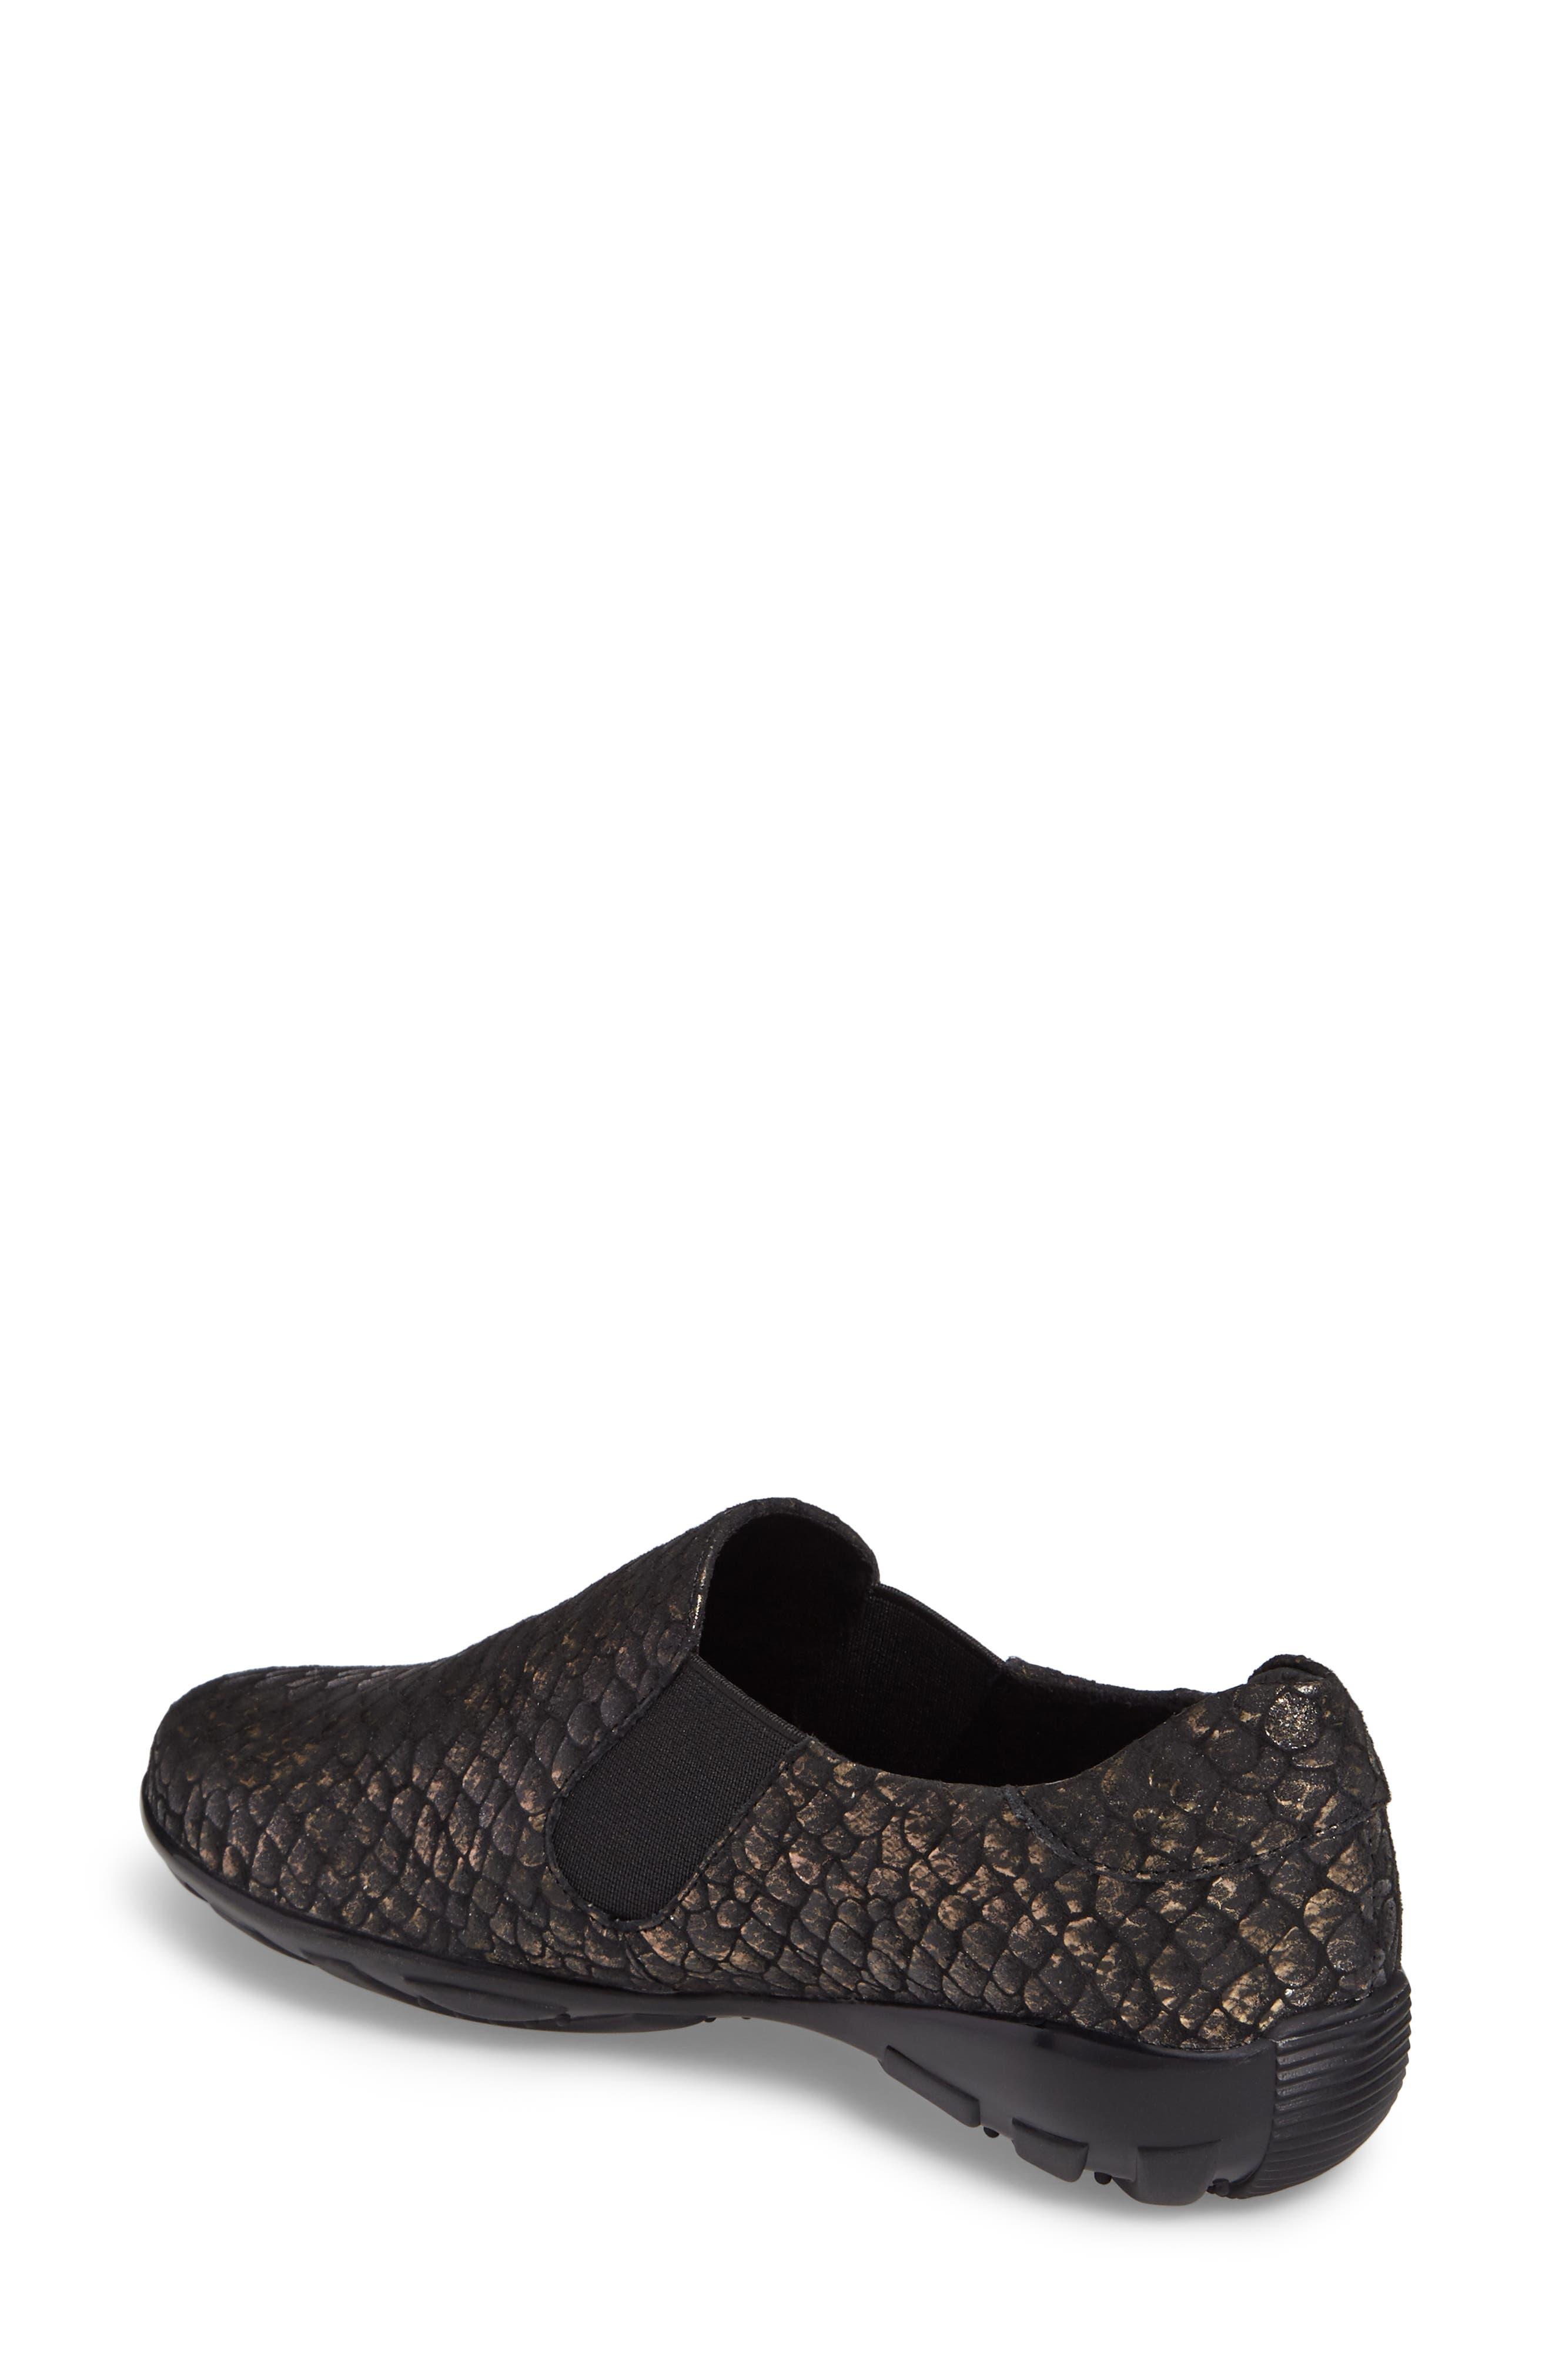 Alternate Image 2  - VANELi 'Anemone' Loafer (Online Only)